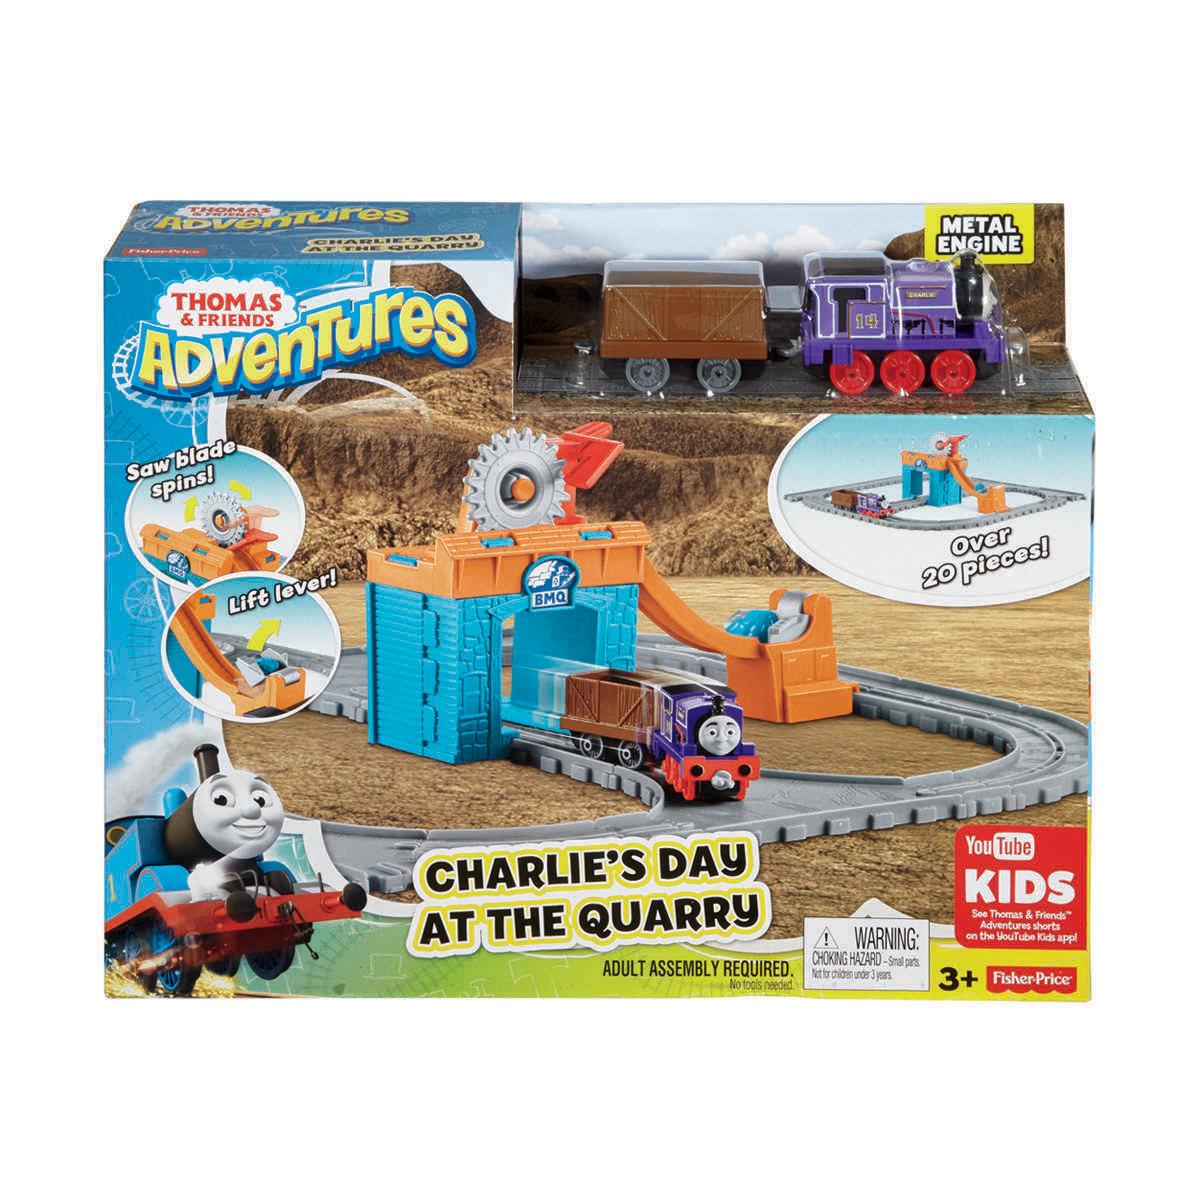 Thomas Amp Friends Adventures Train Set Assorted Kmart